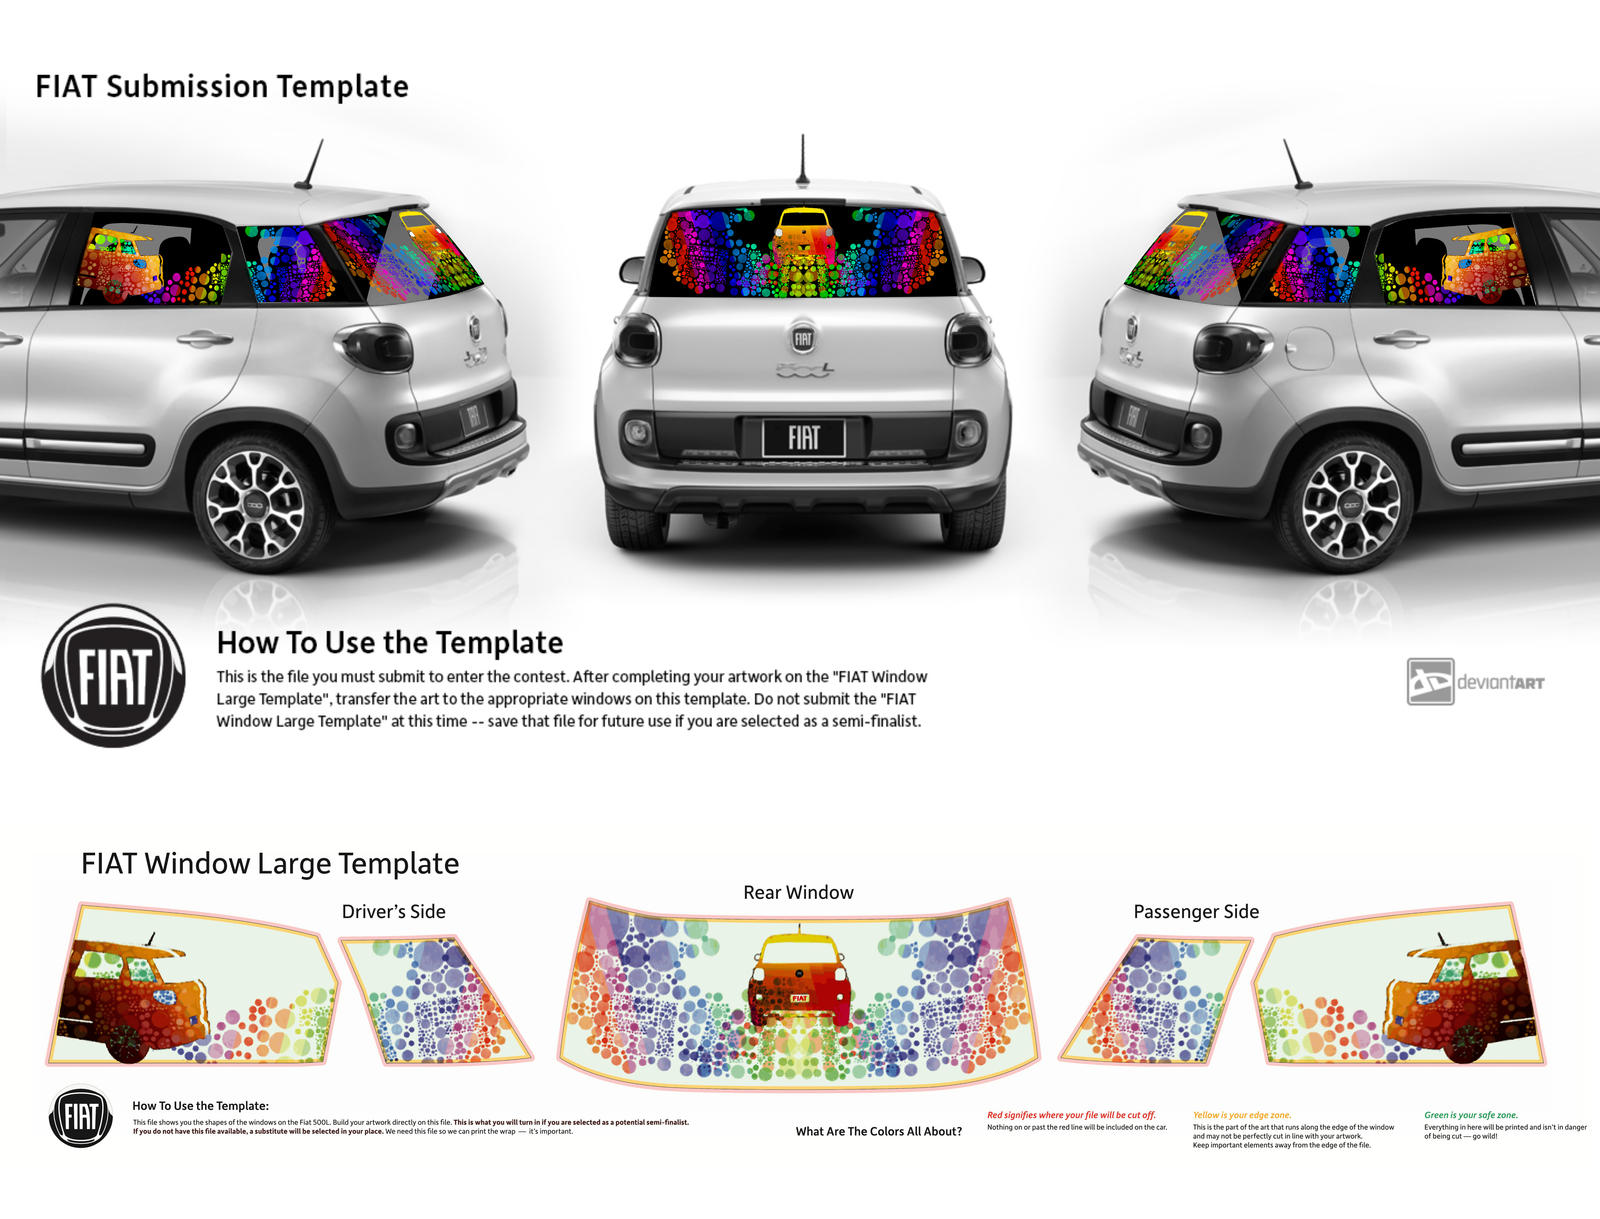 FIAT- Bubbling Rainbow Fuels by ABRAQIB94